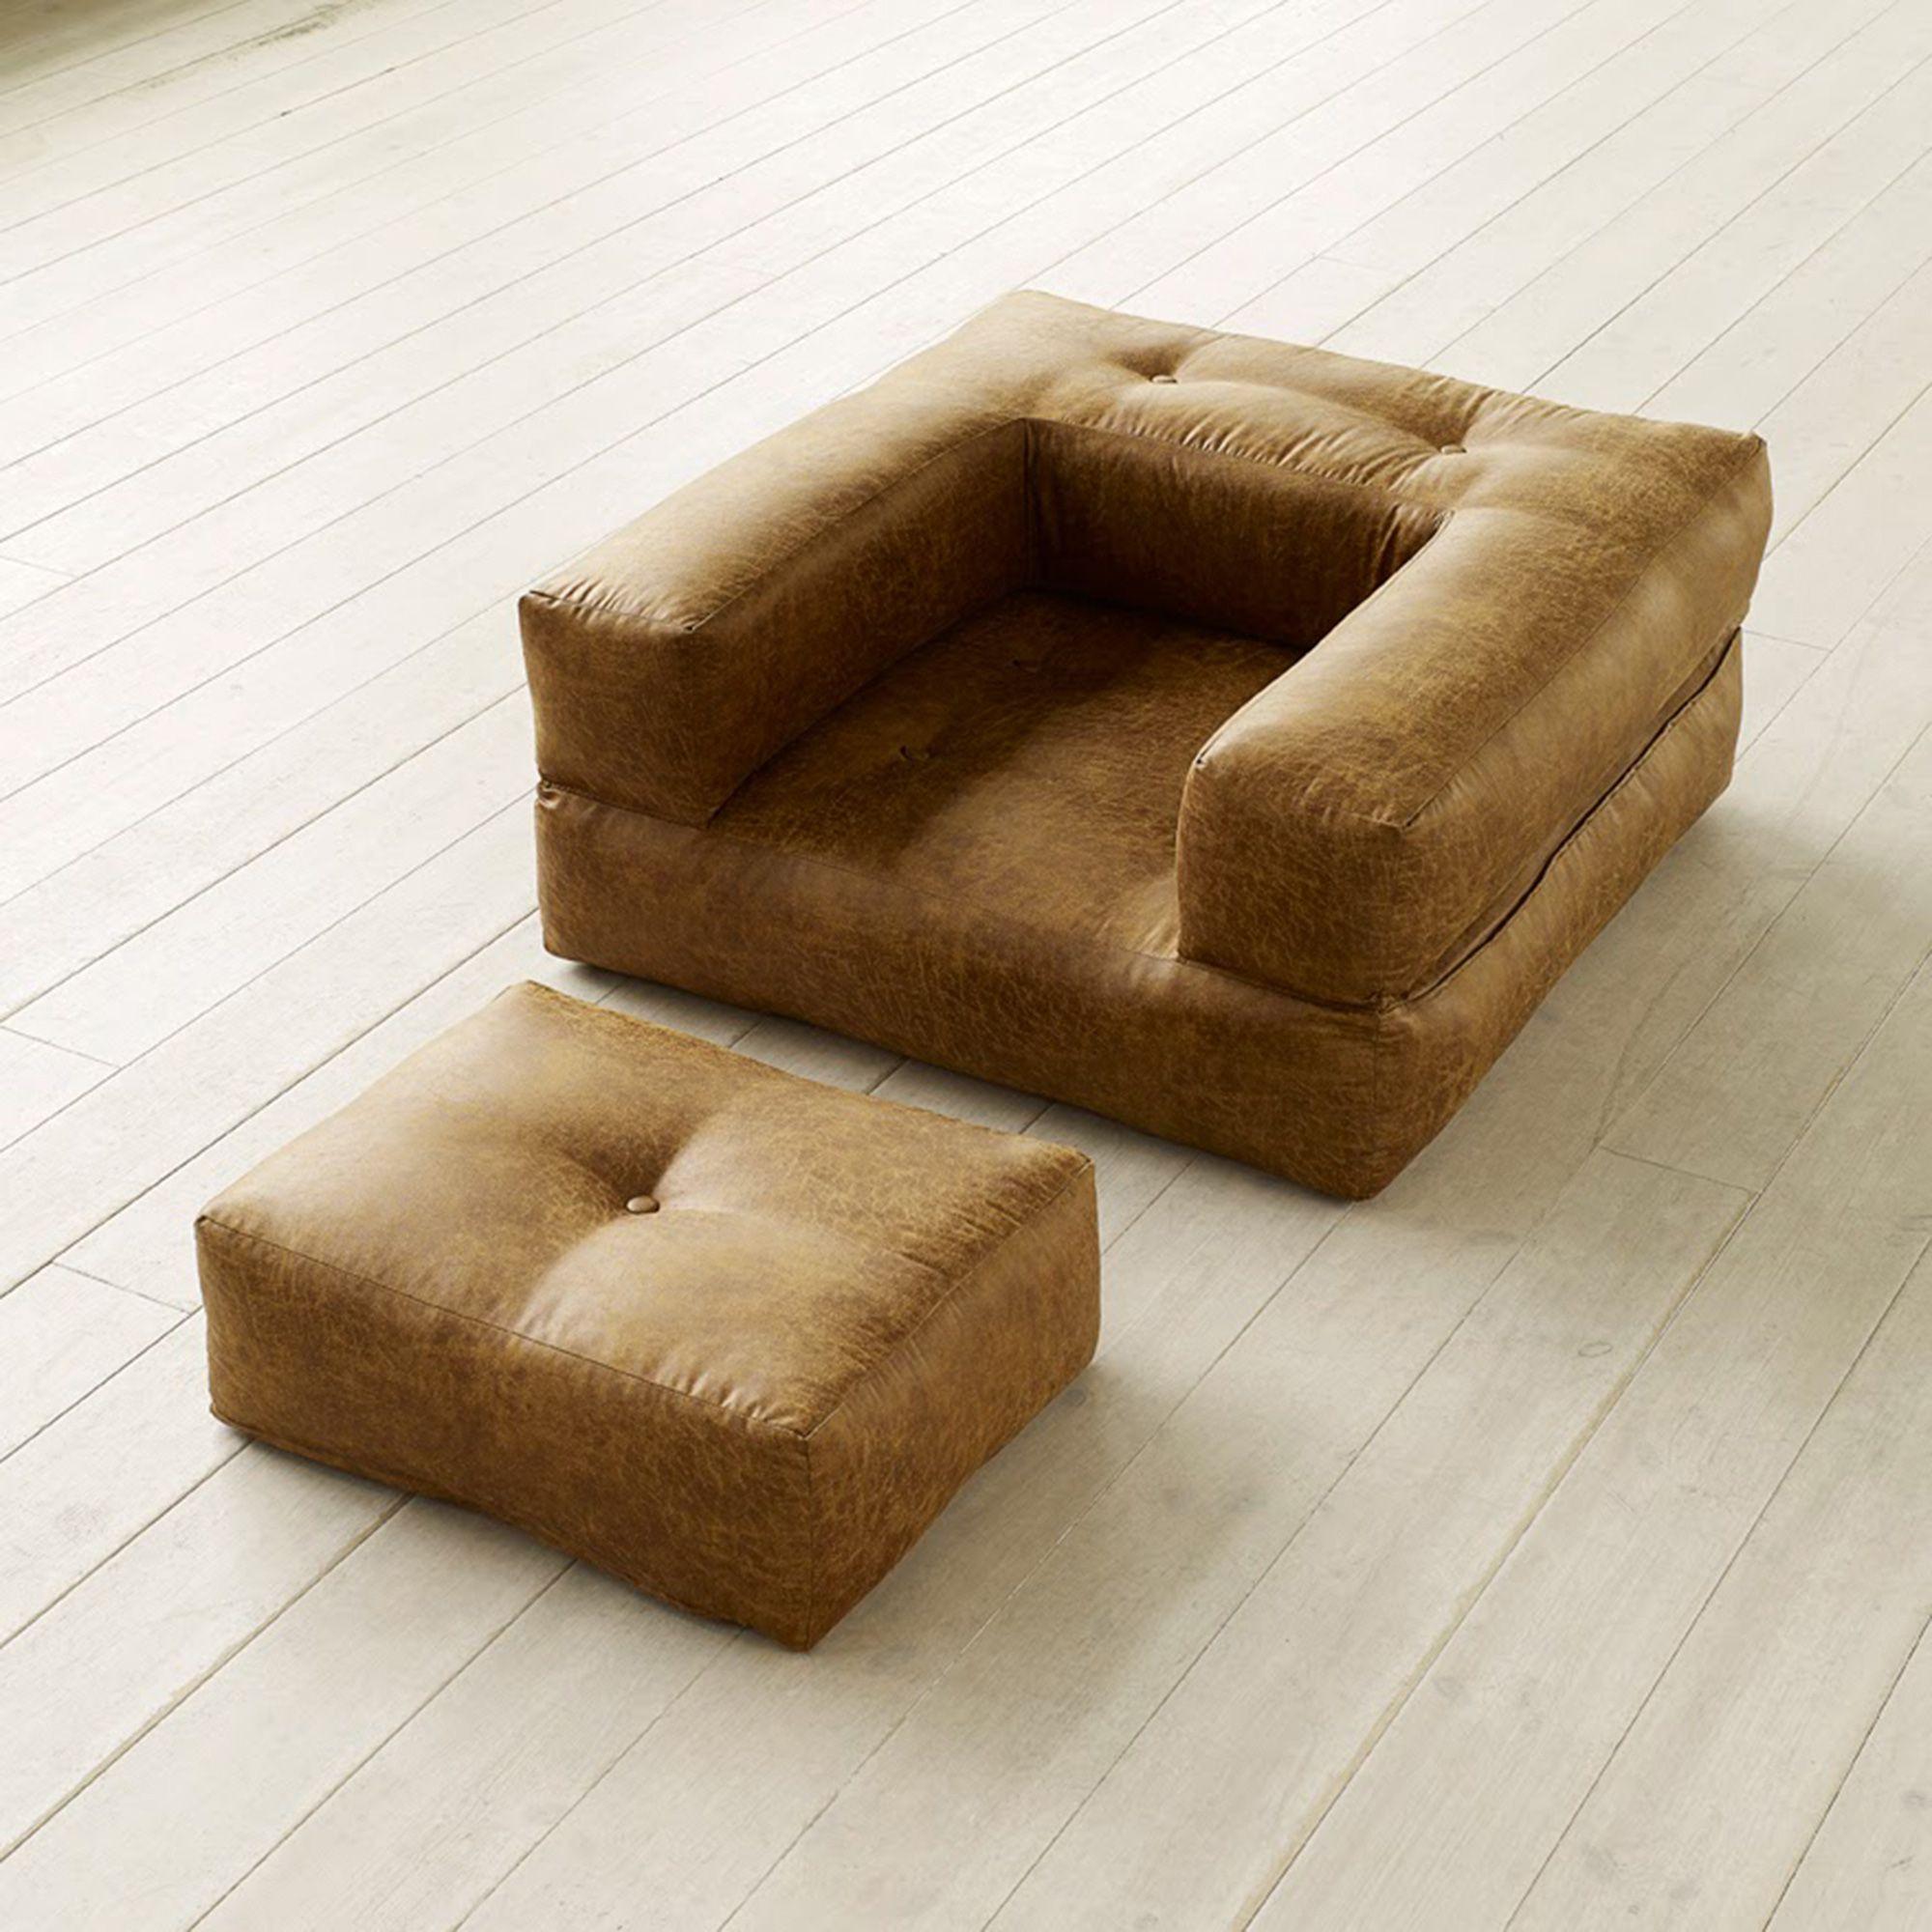 Poltrona letto futon cube chair vintage karup for Poltrona letto futon